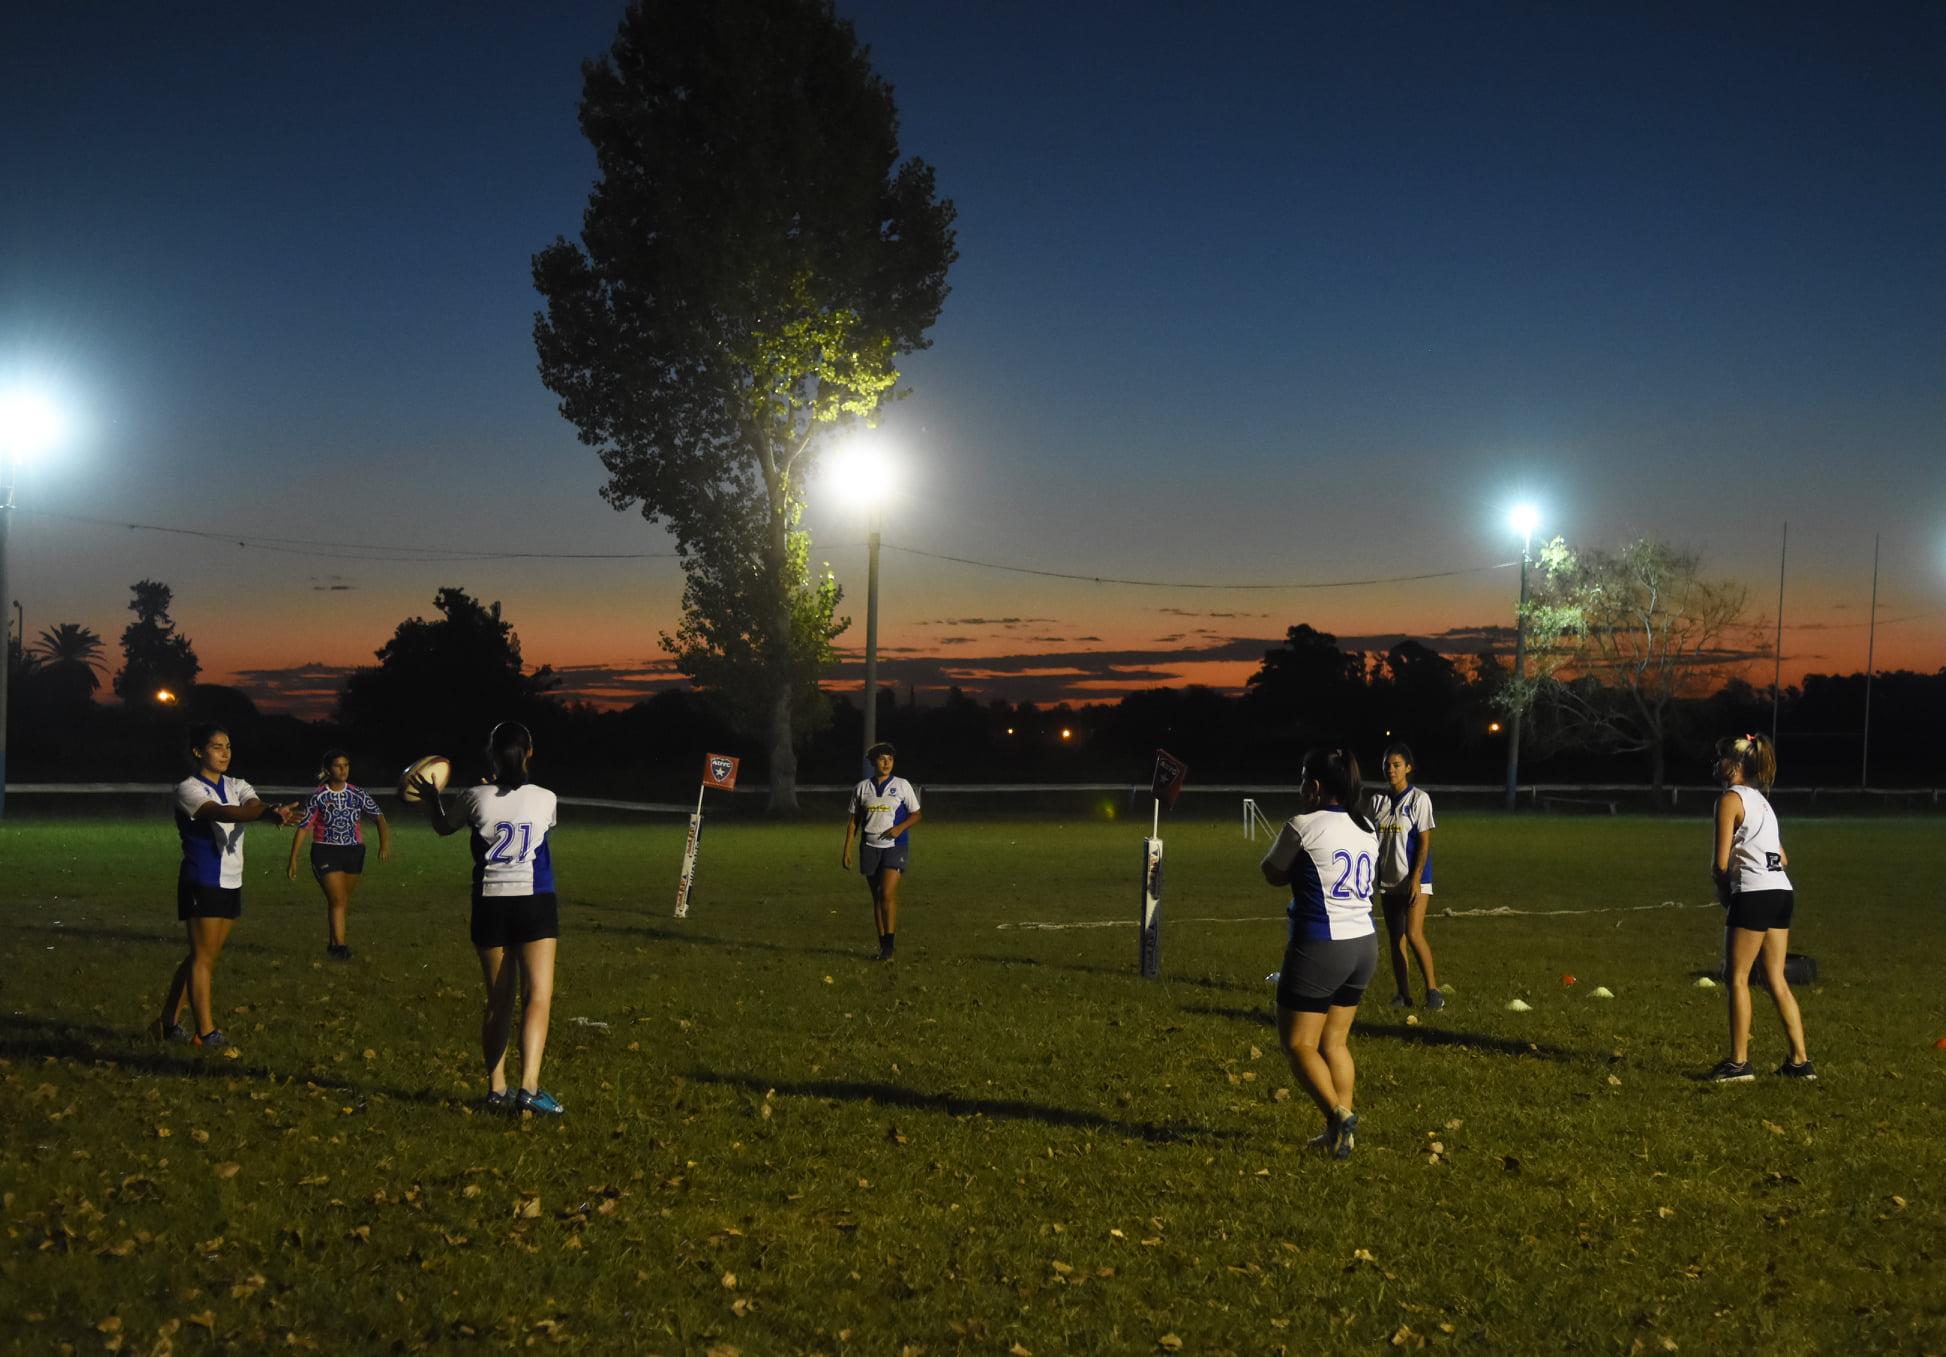 deporte noche rugby femenino